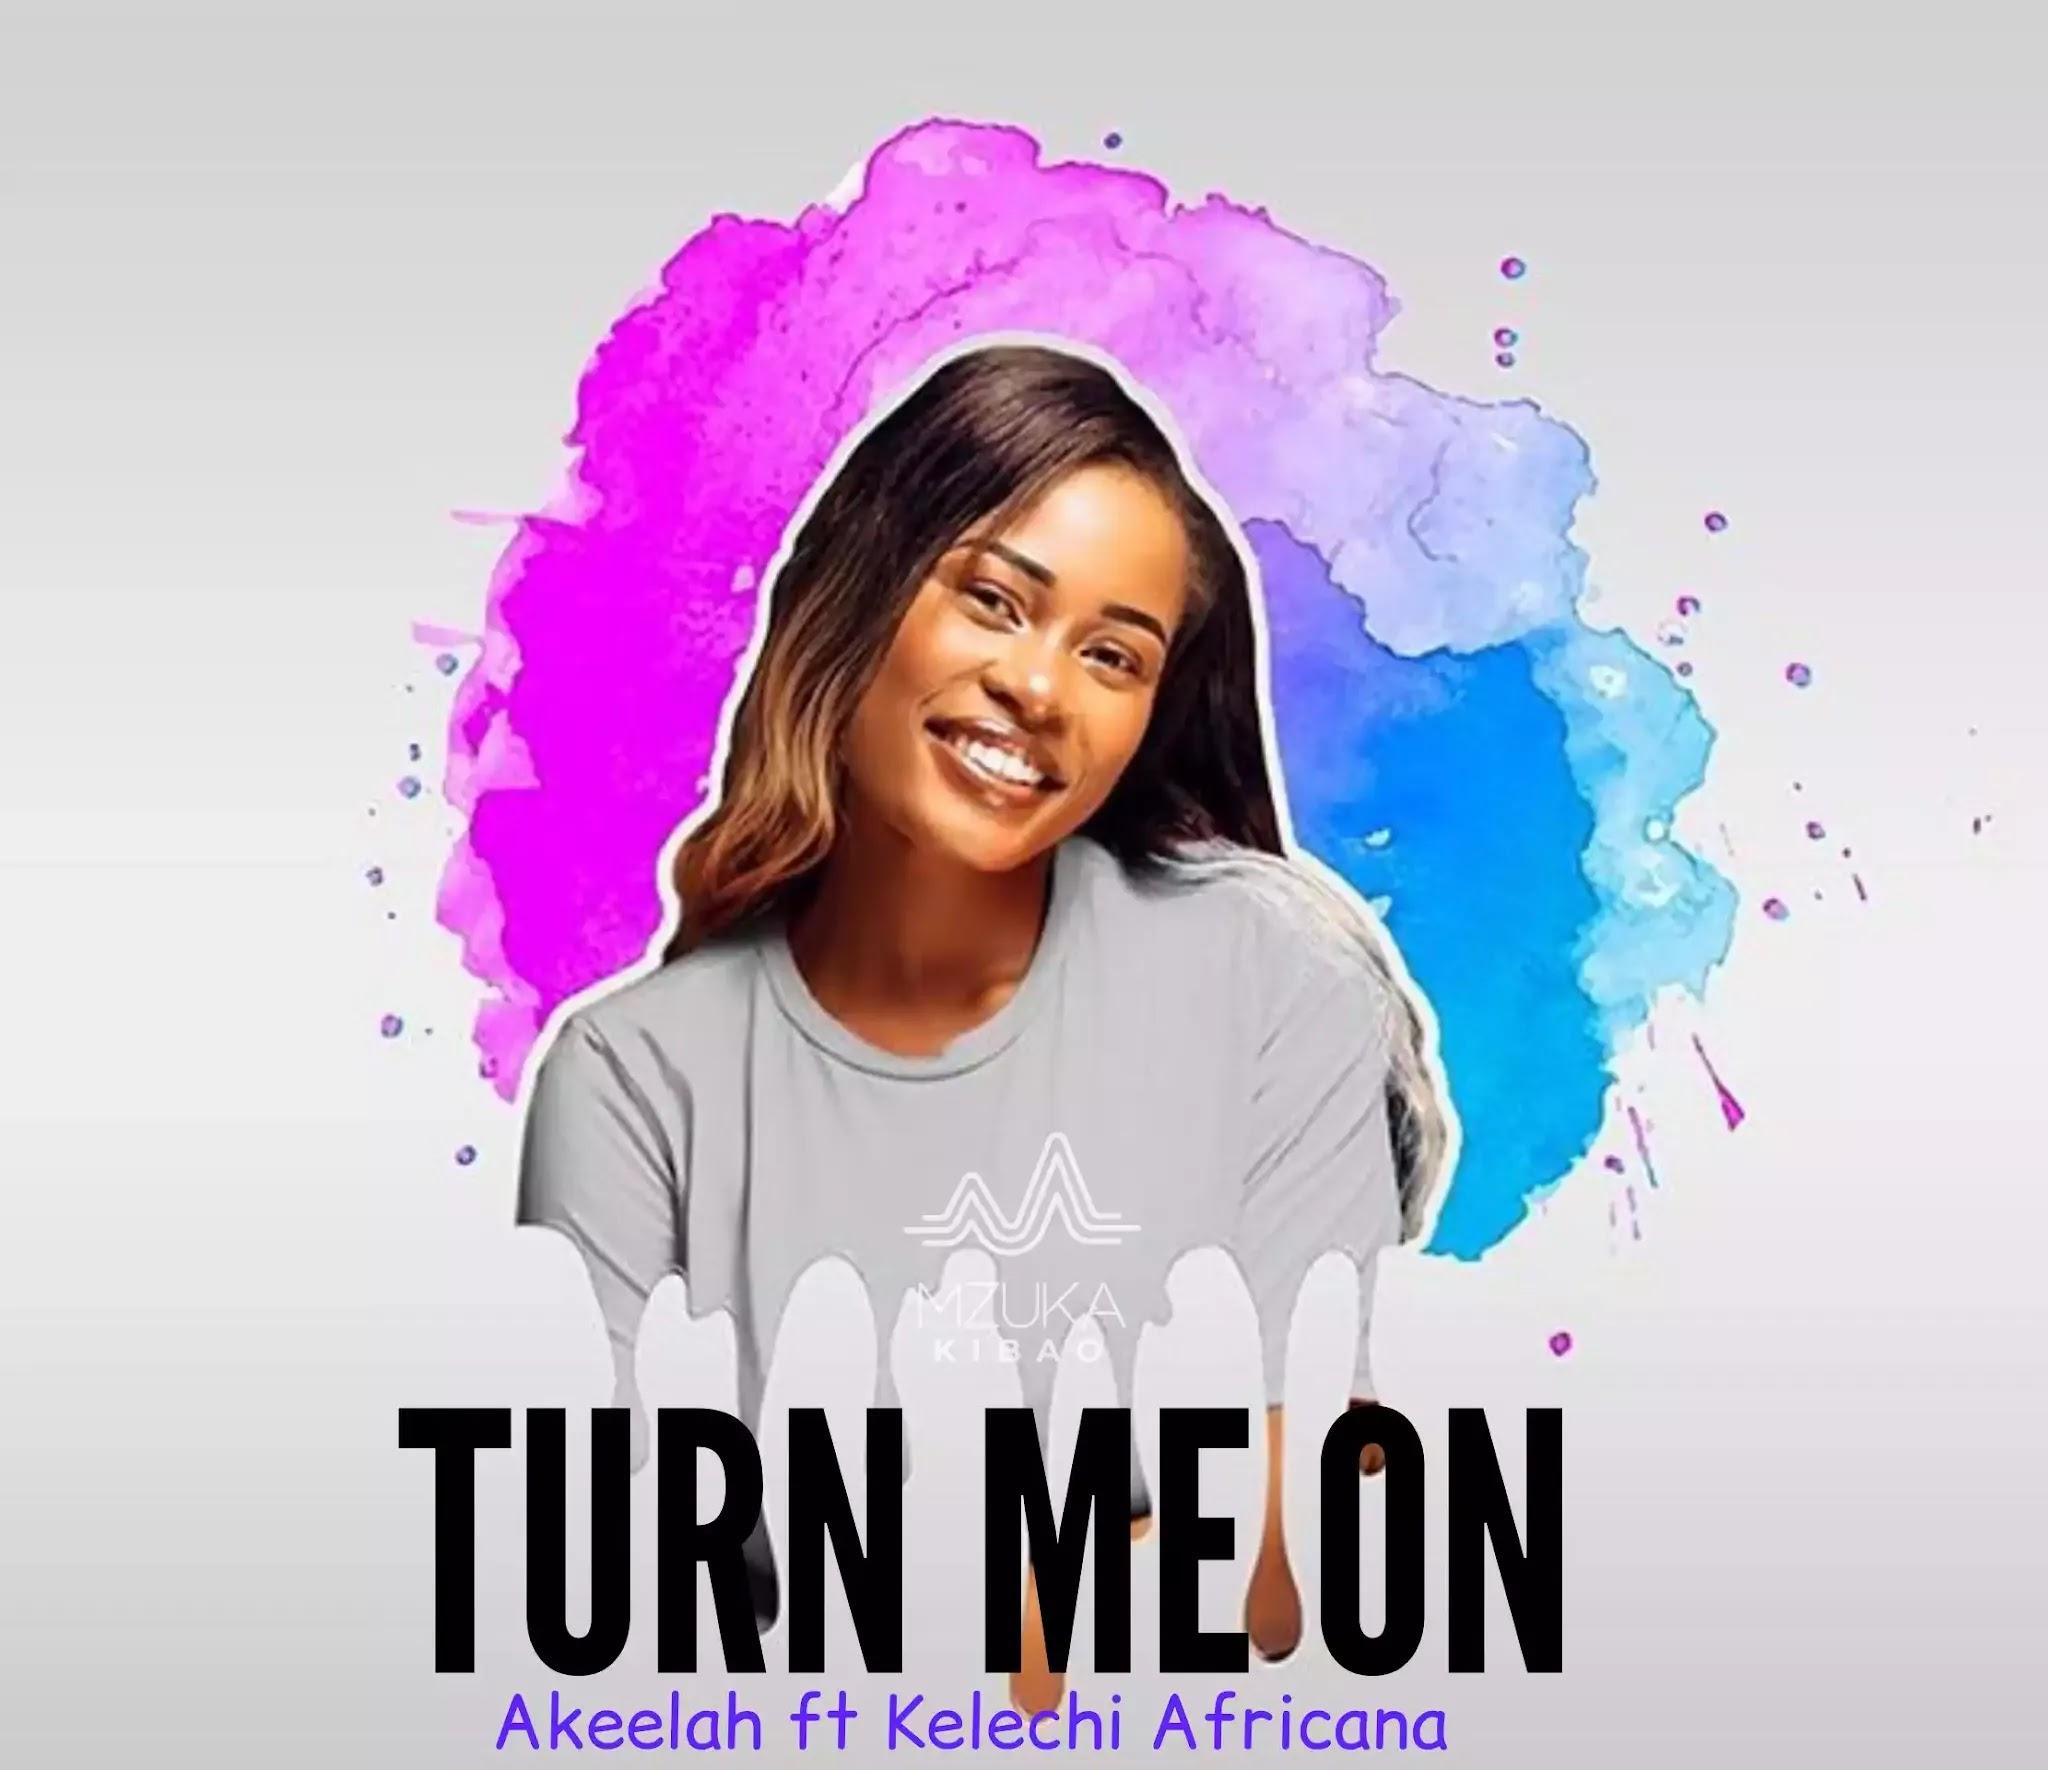 Akeelah ft Kelechi africana - Turn me on